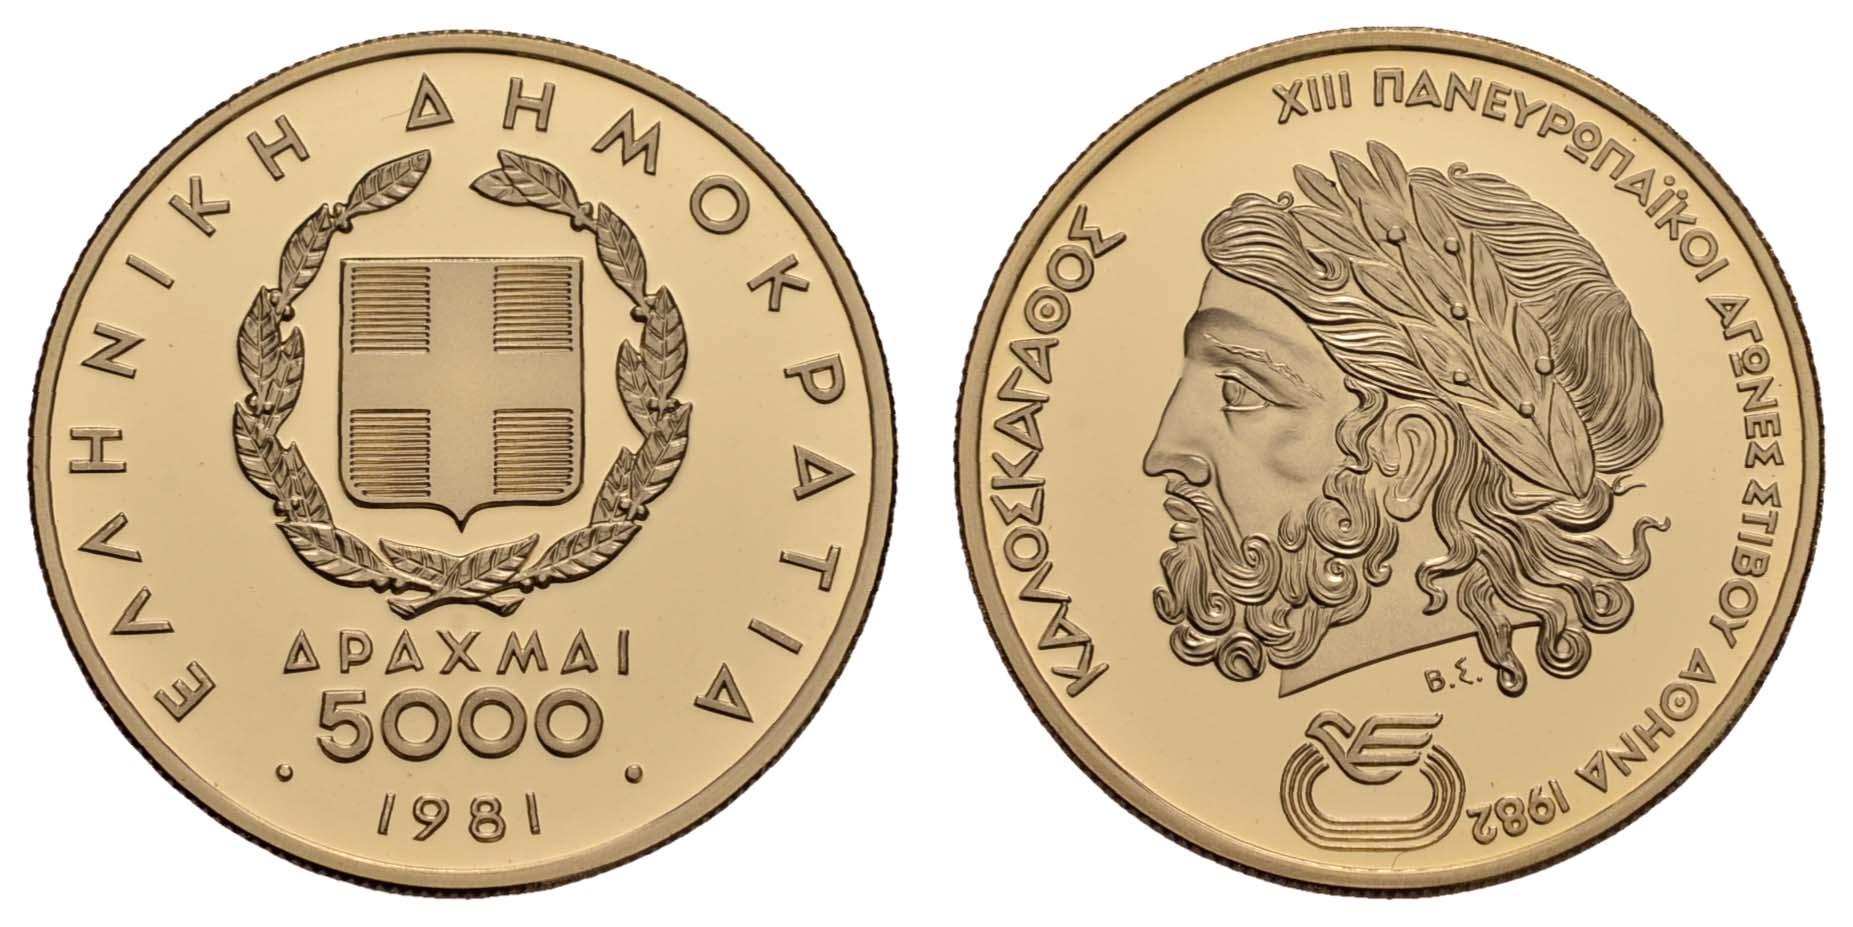 Lot 1560 - europa ab 1800 - Griechenland -  Auktionshaus Ulrich Felzmann GmbH & Co. KG Coins single lots